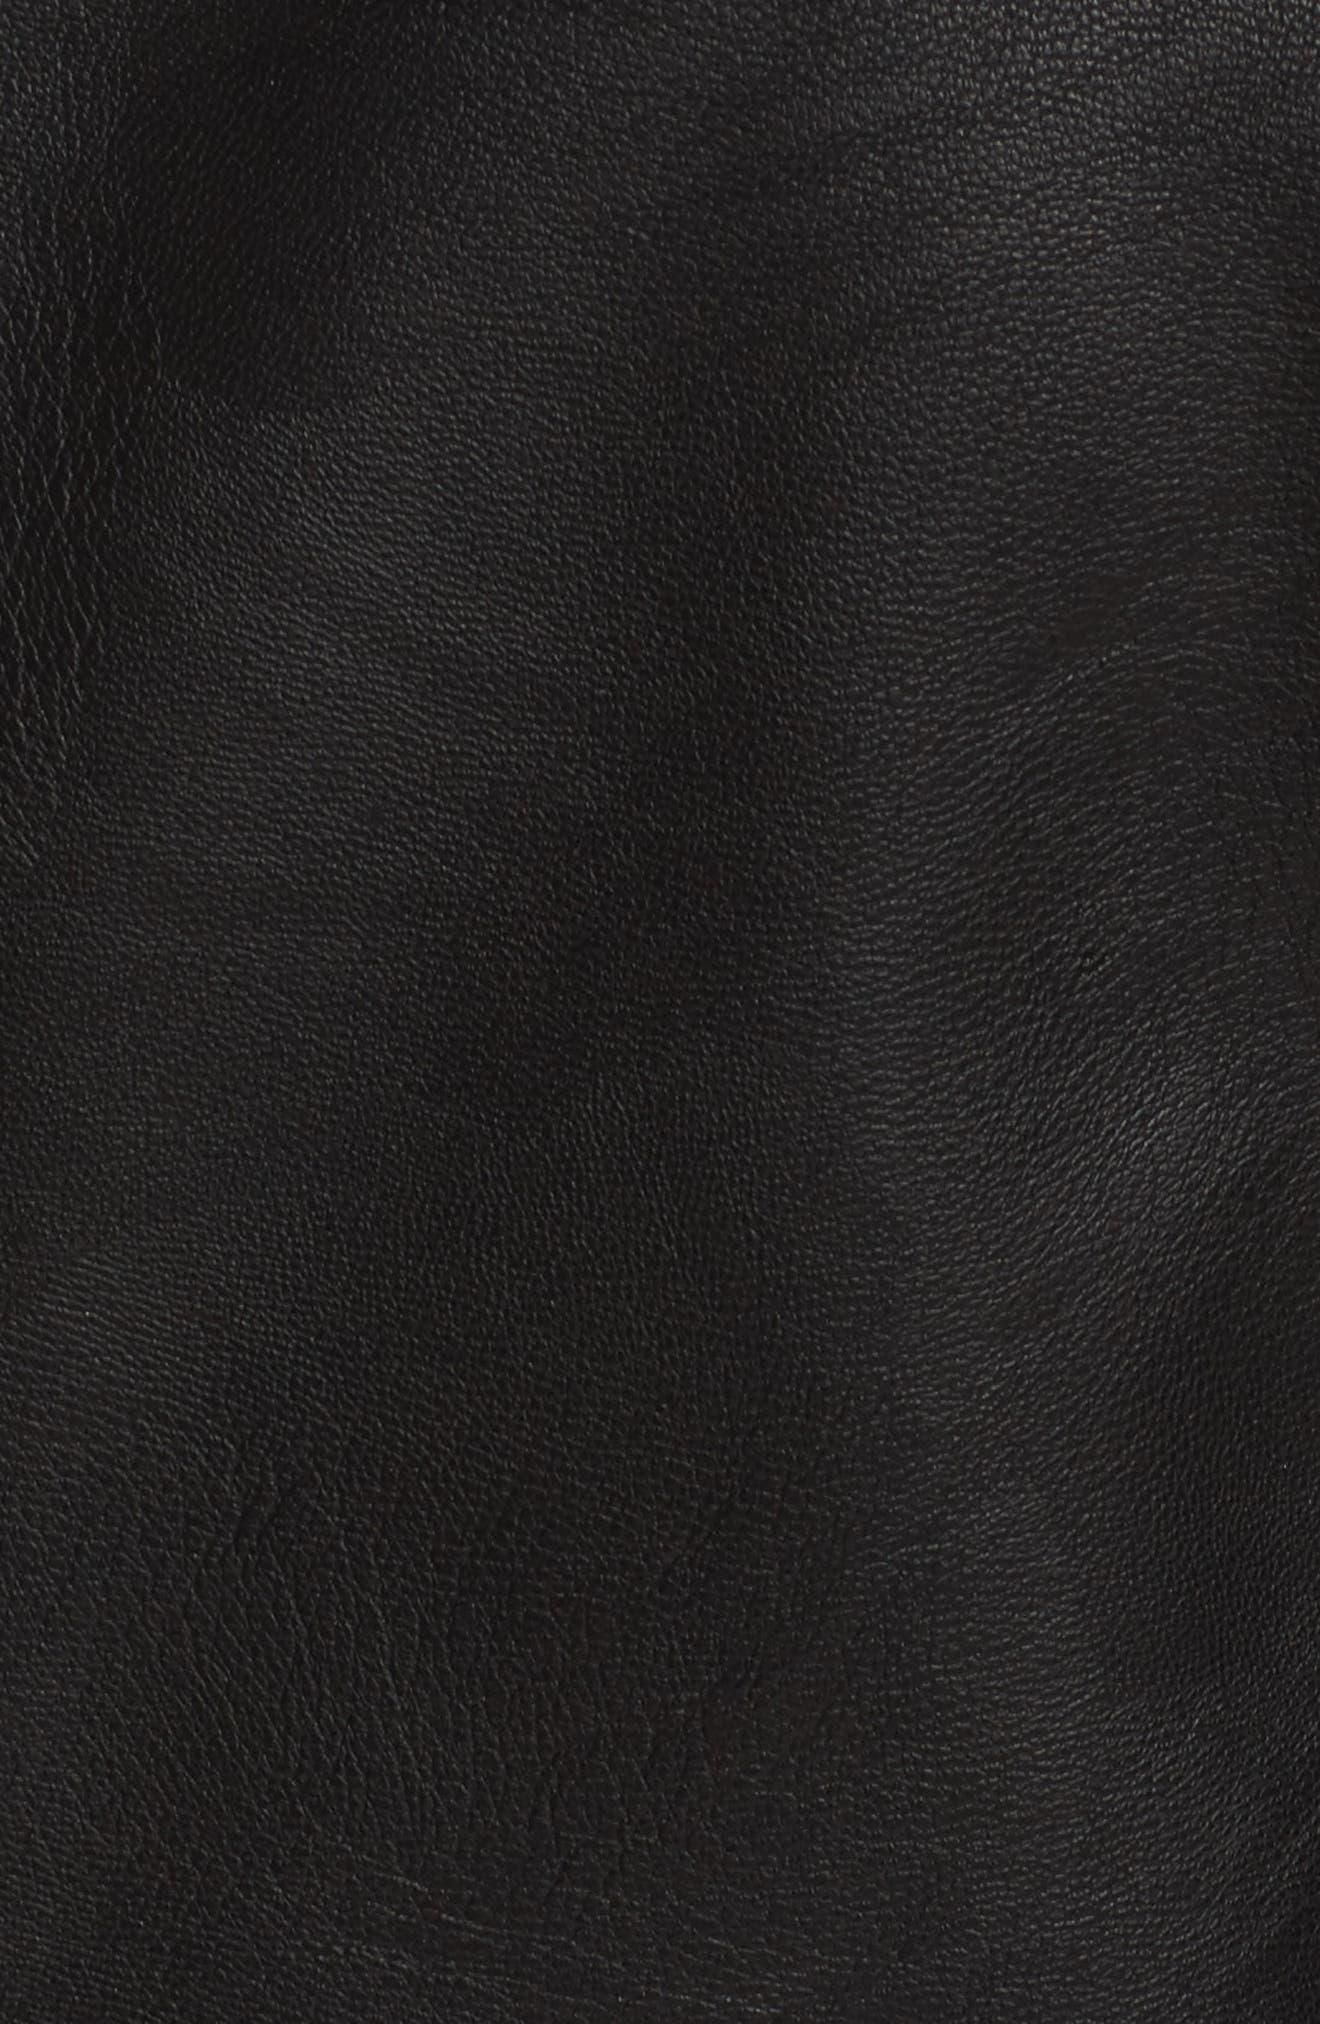 Lamb Touch Faux Leather Moto Jacket,                             Alternate thumbnail 5, color,                             Black